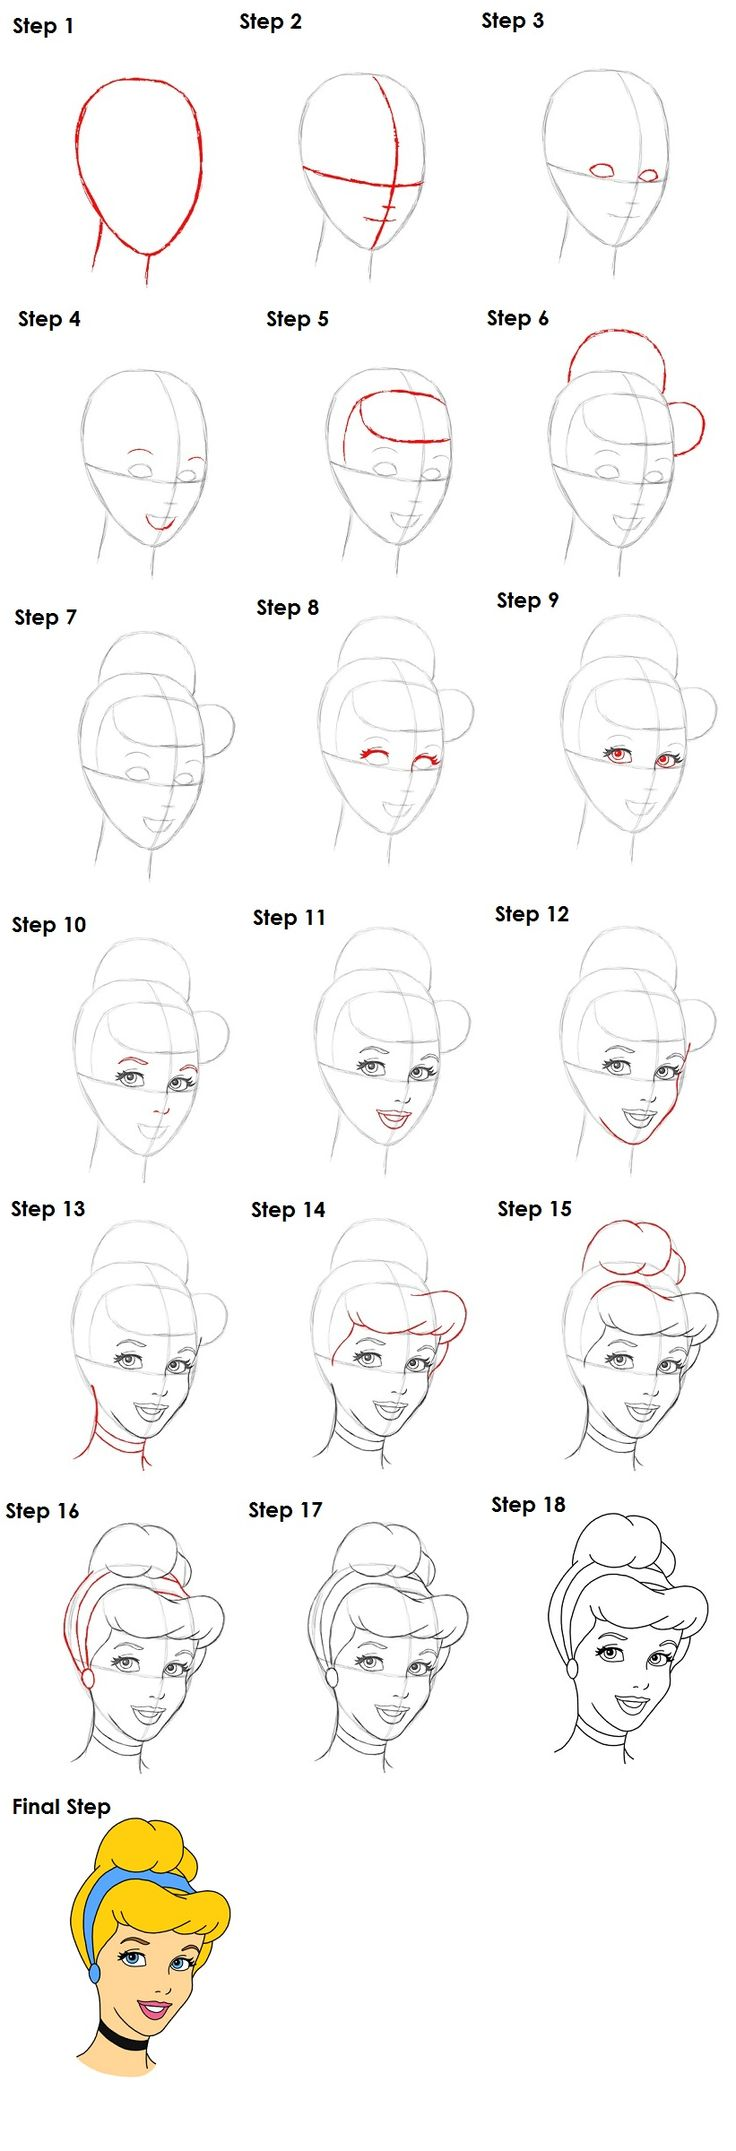 How to draw Cinderella | Disney princesses | Pinterest